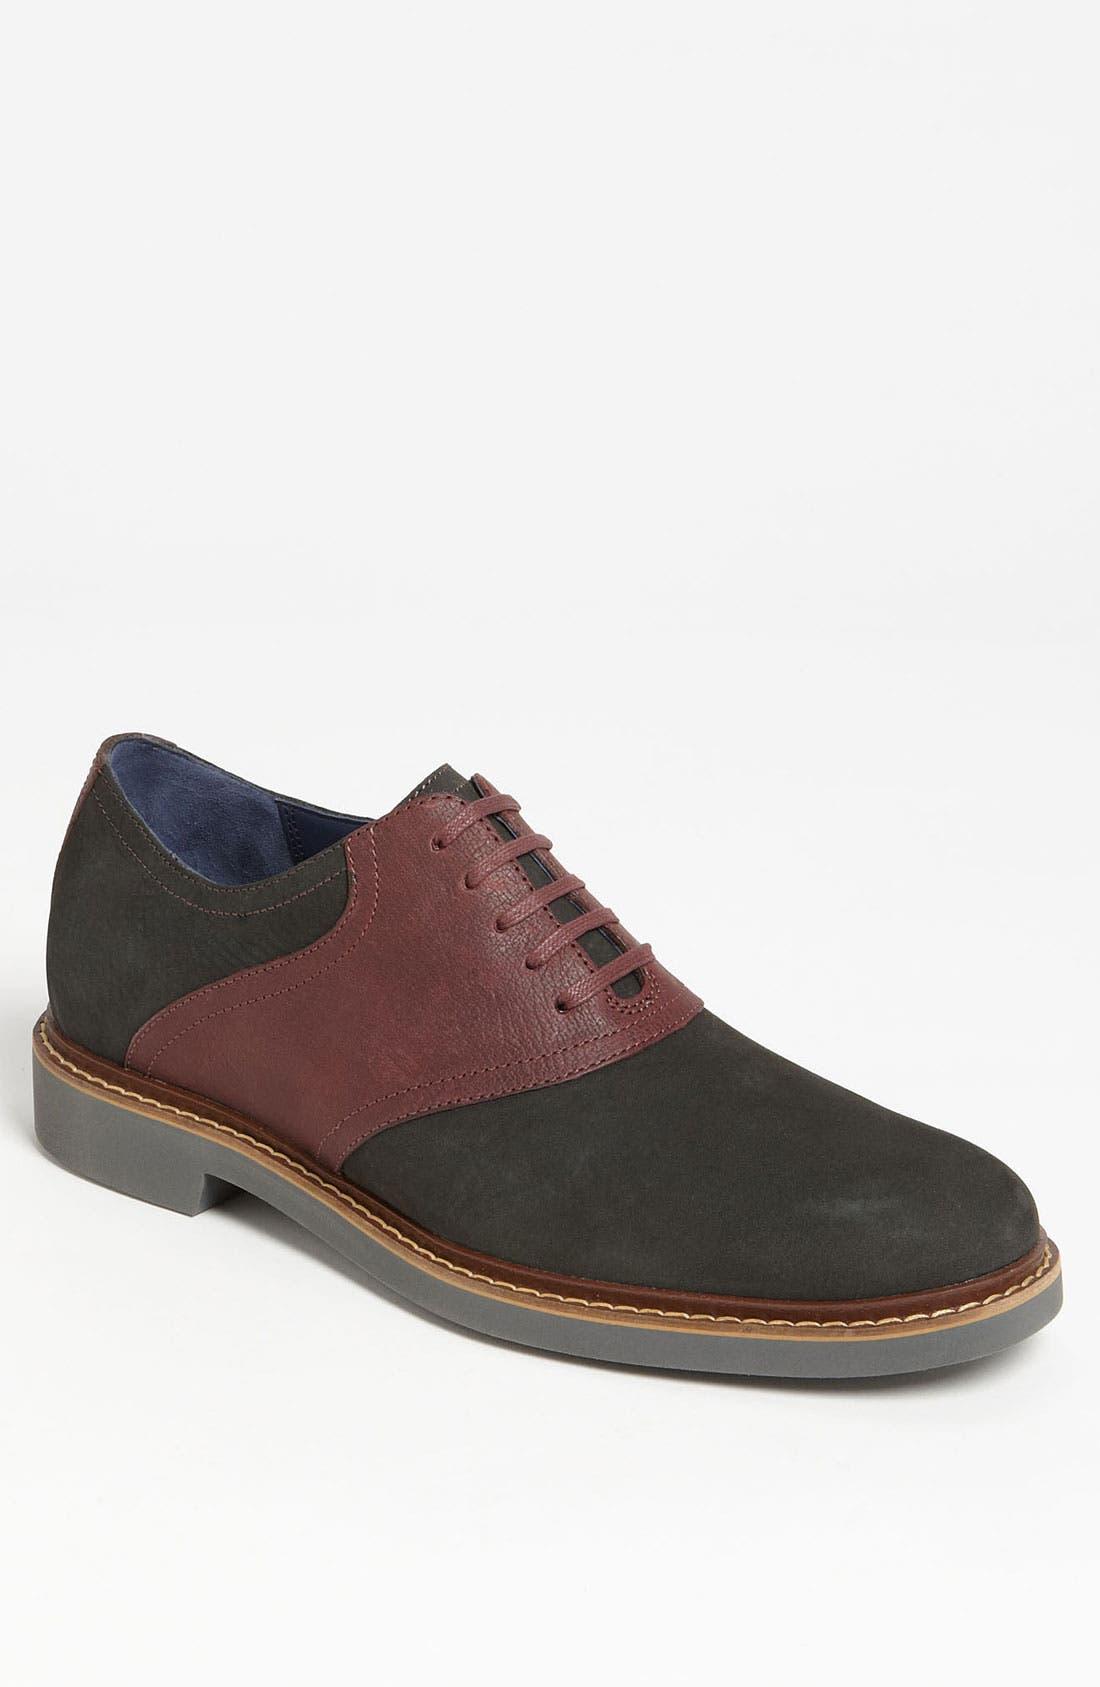 Main Image - Cole Haan 'Air Harrison' Saddle Shoe